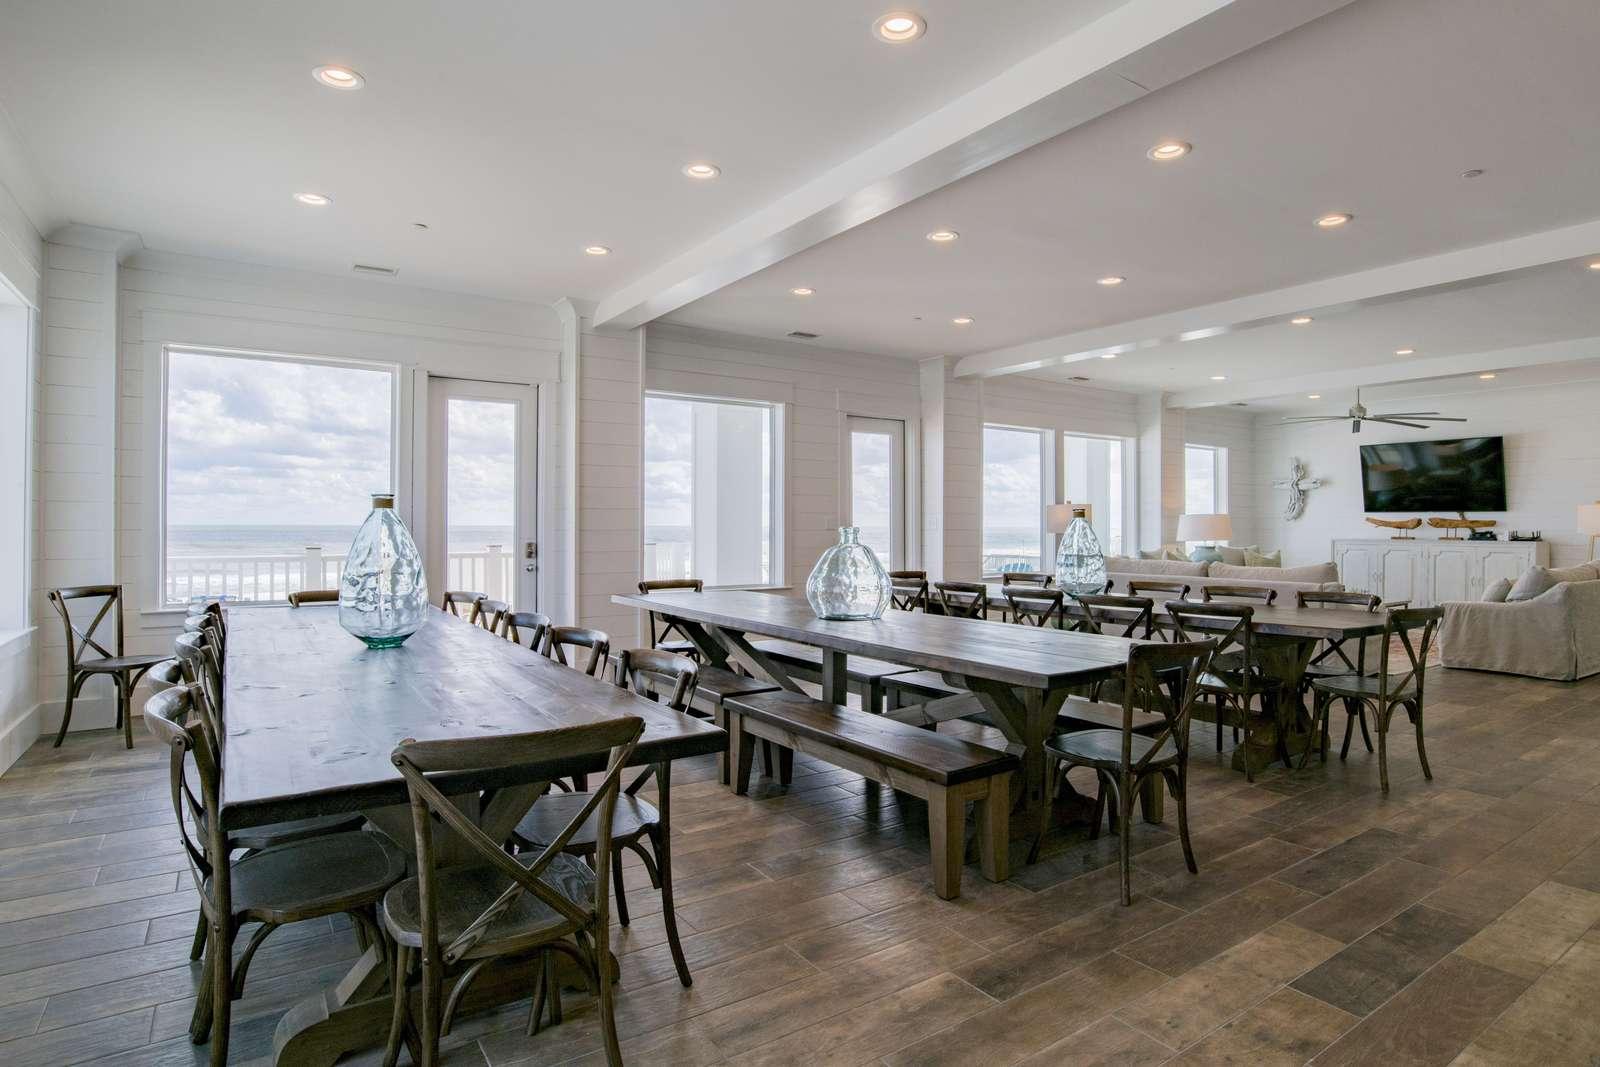 3 custom built dining tables 12 ft Long. Seat 12 per Table.